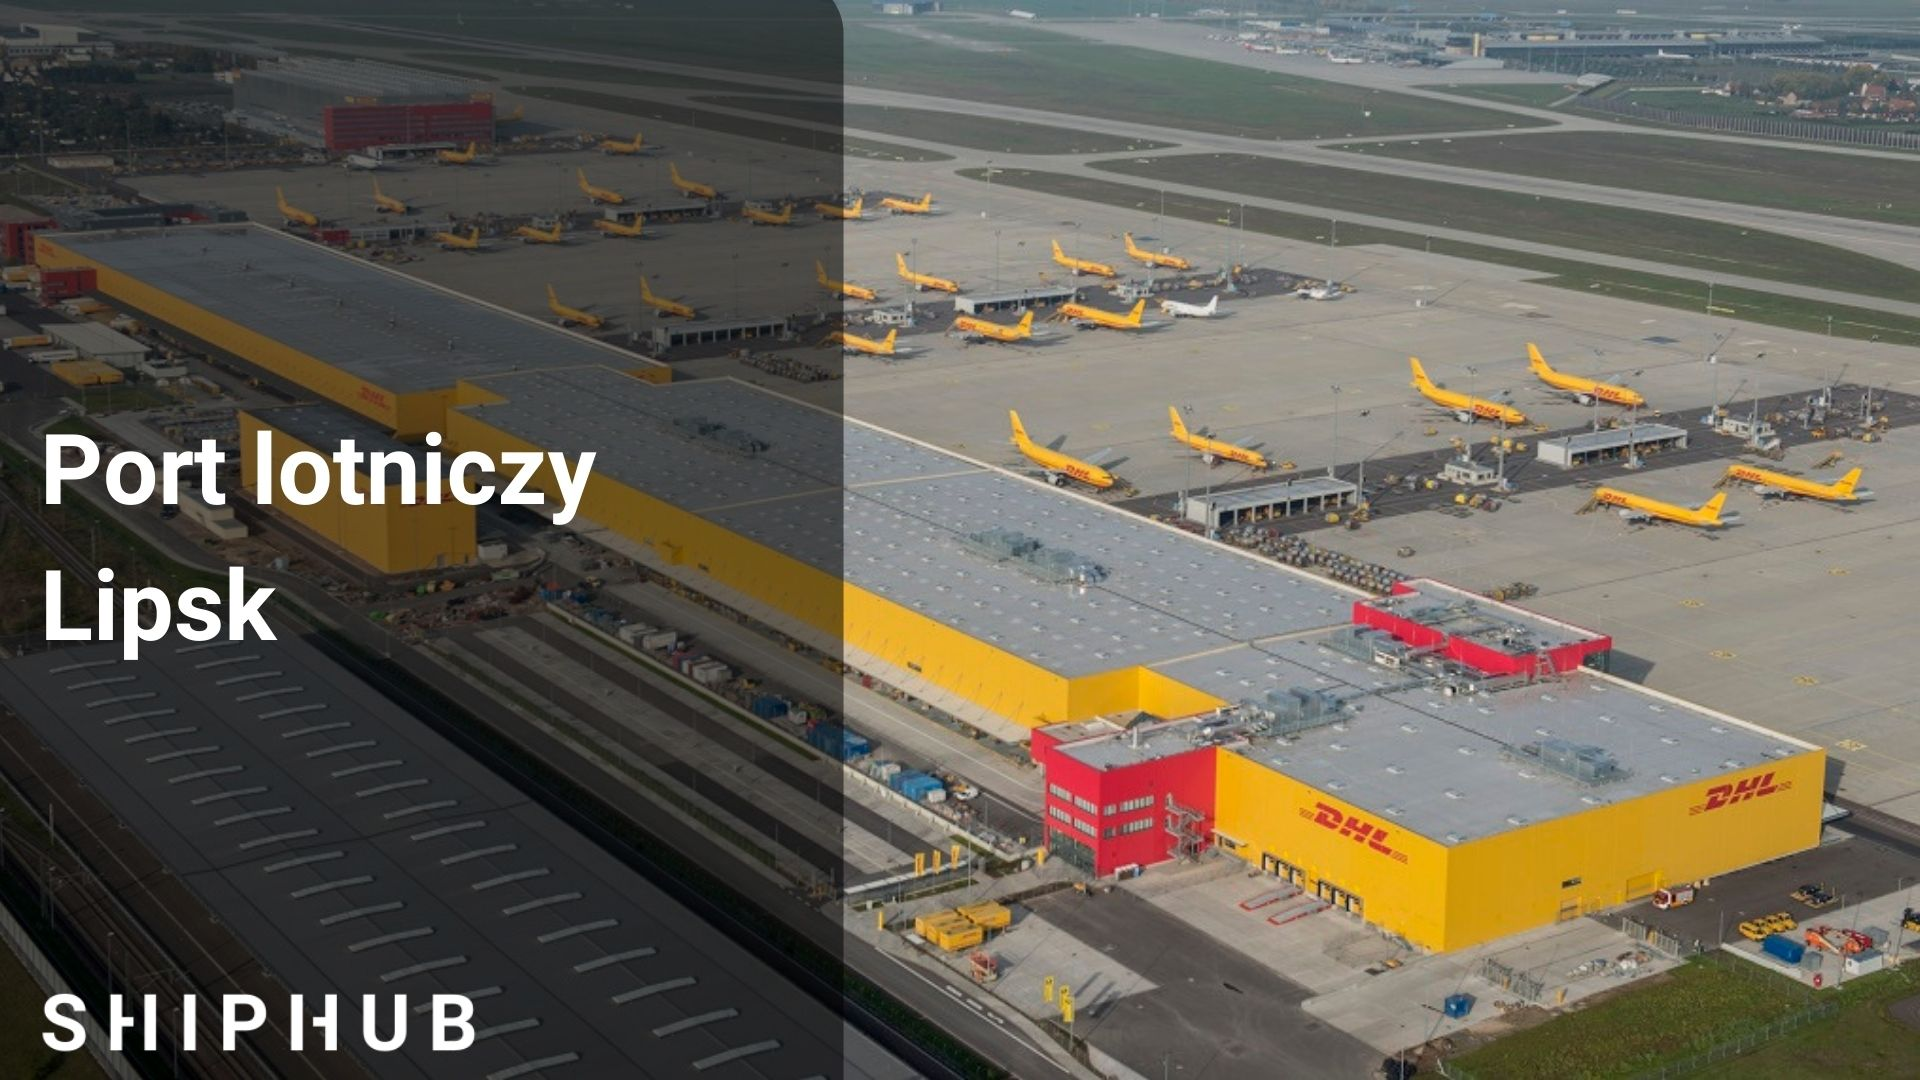 Port lotniczy Lipsk